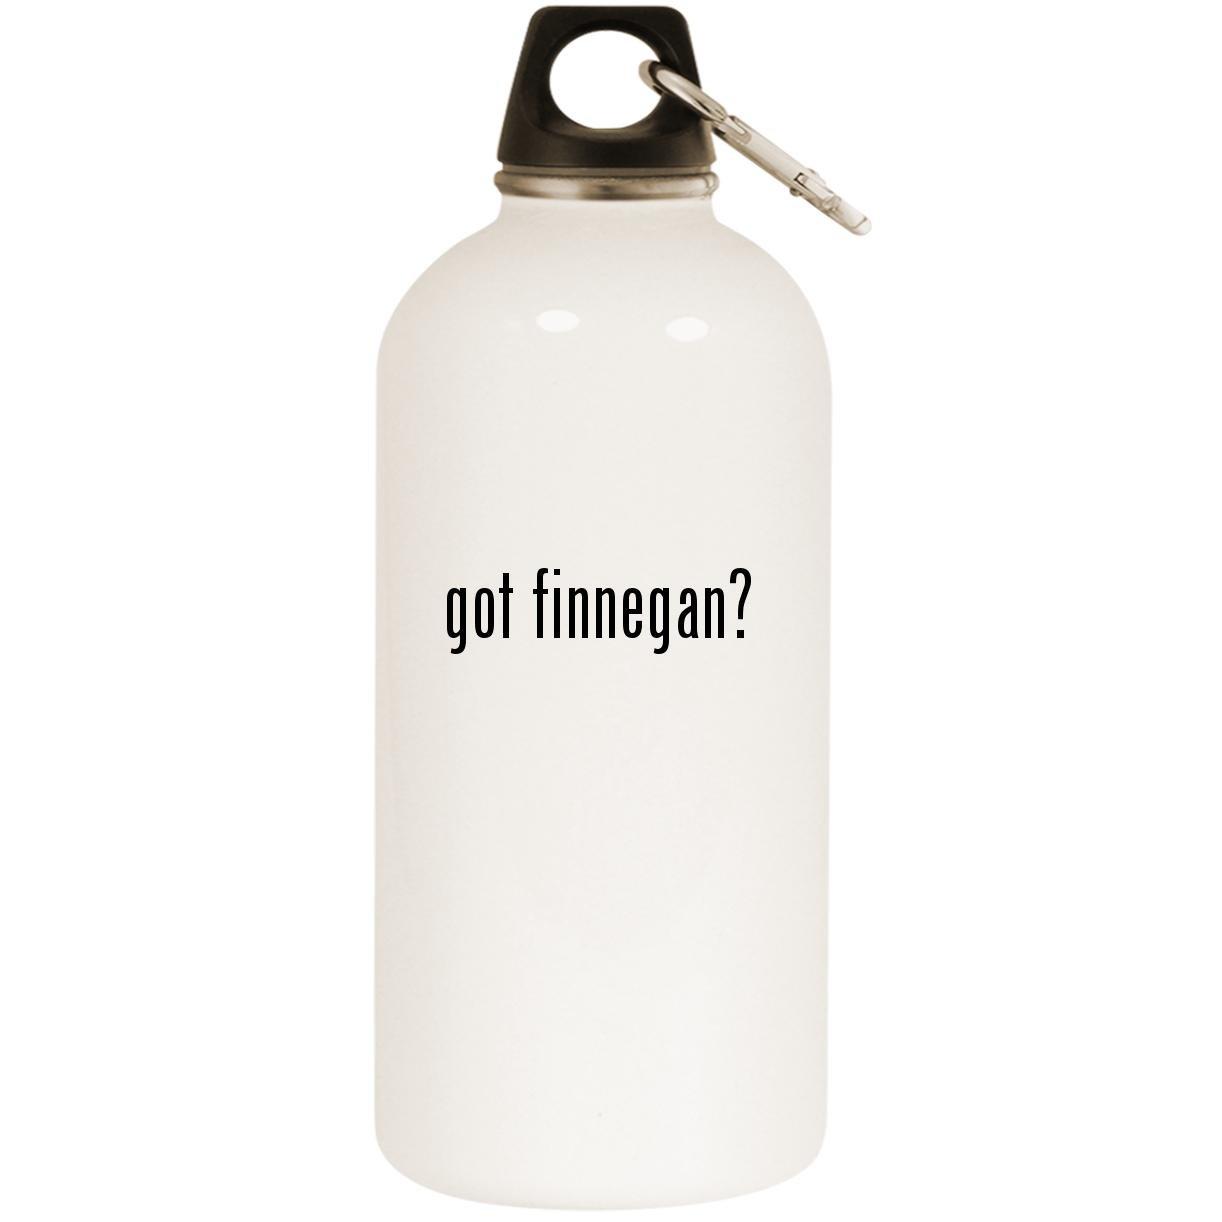 got finnegan? - White 20oz Stainless Steel Water Bottle with Carabiner